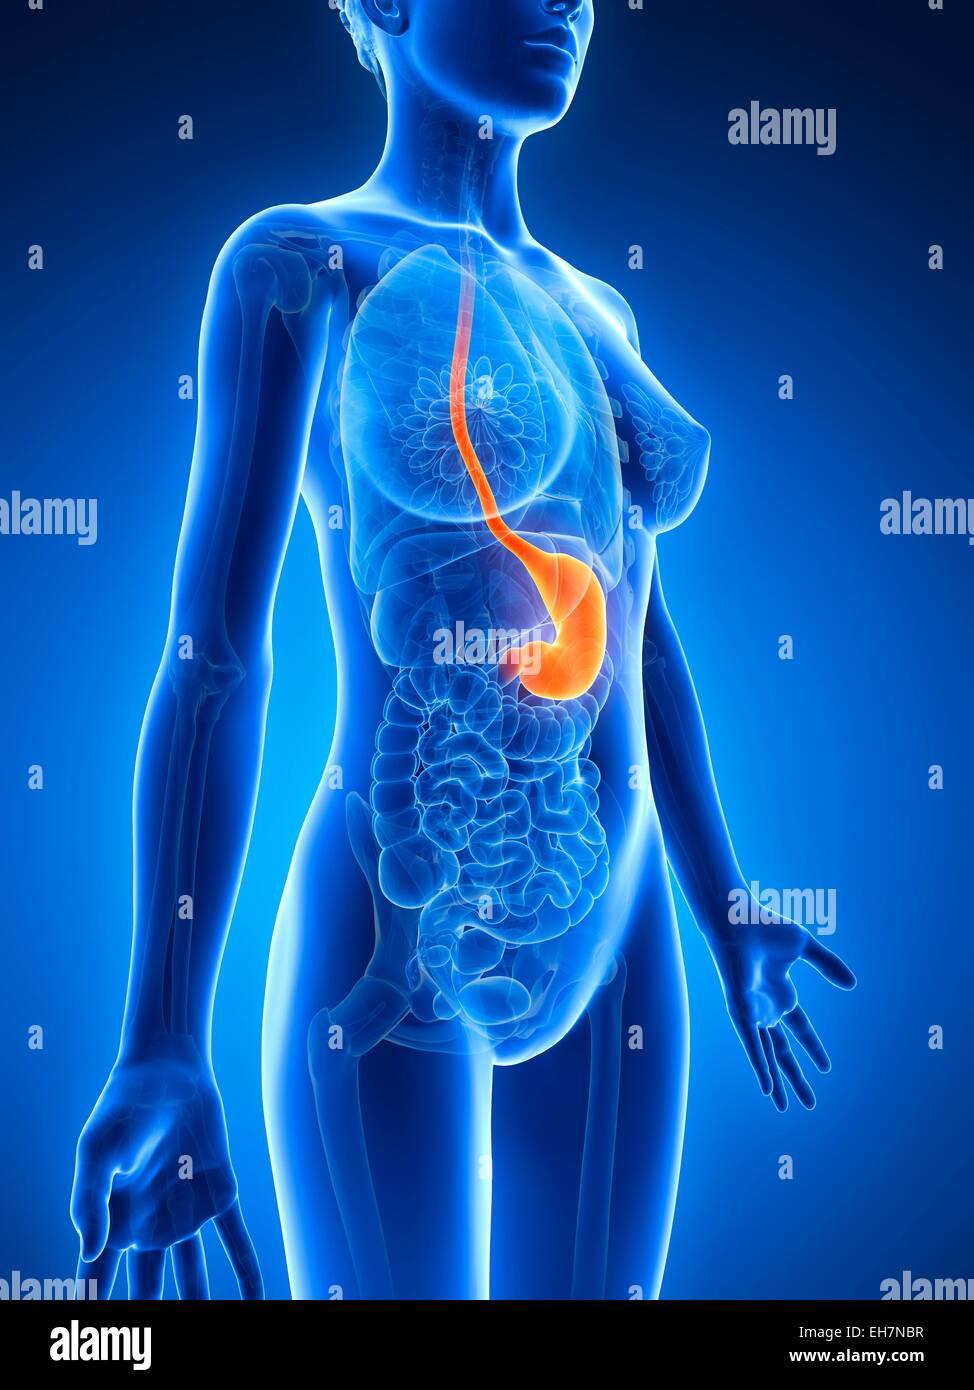 Anatomy Of Female Stomach Illustration Stock Photo 79461083 Alamy